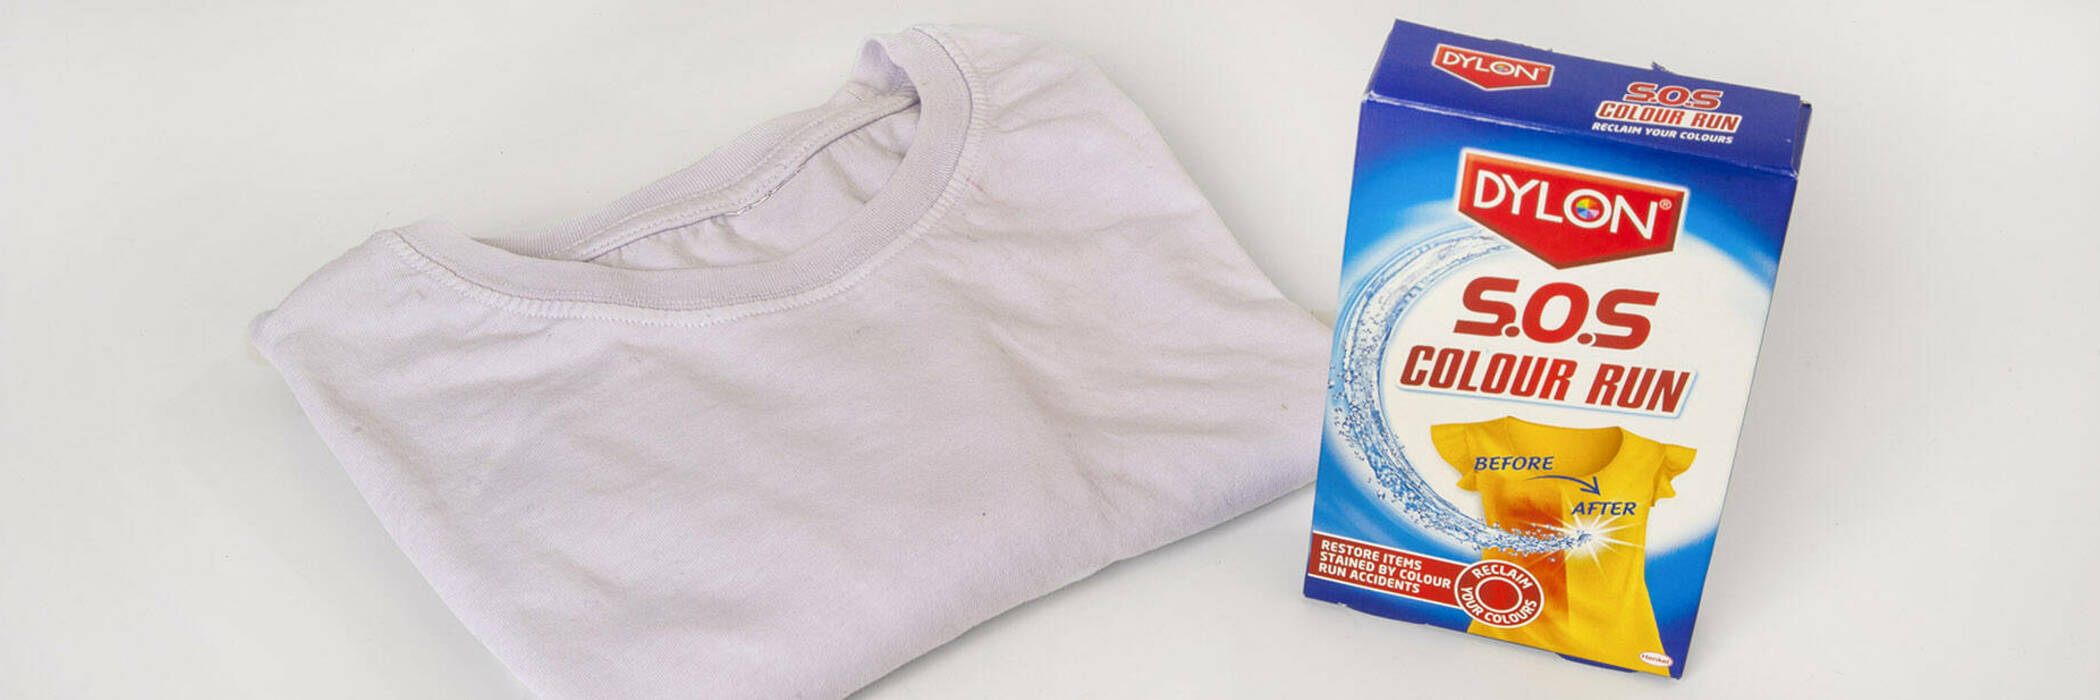 Dylon SOS box with t-shirt